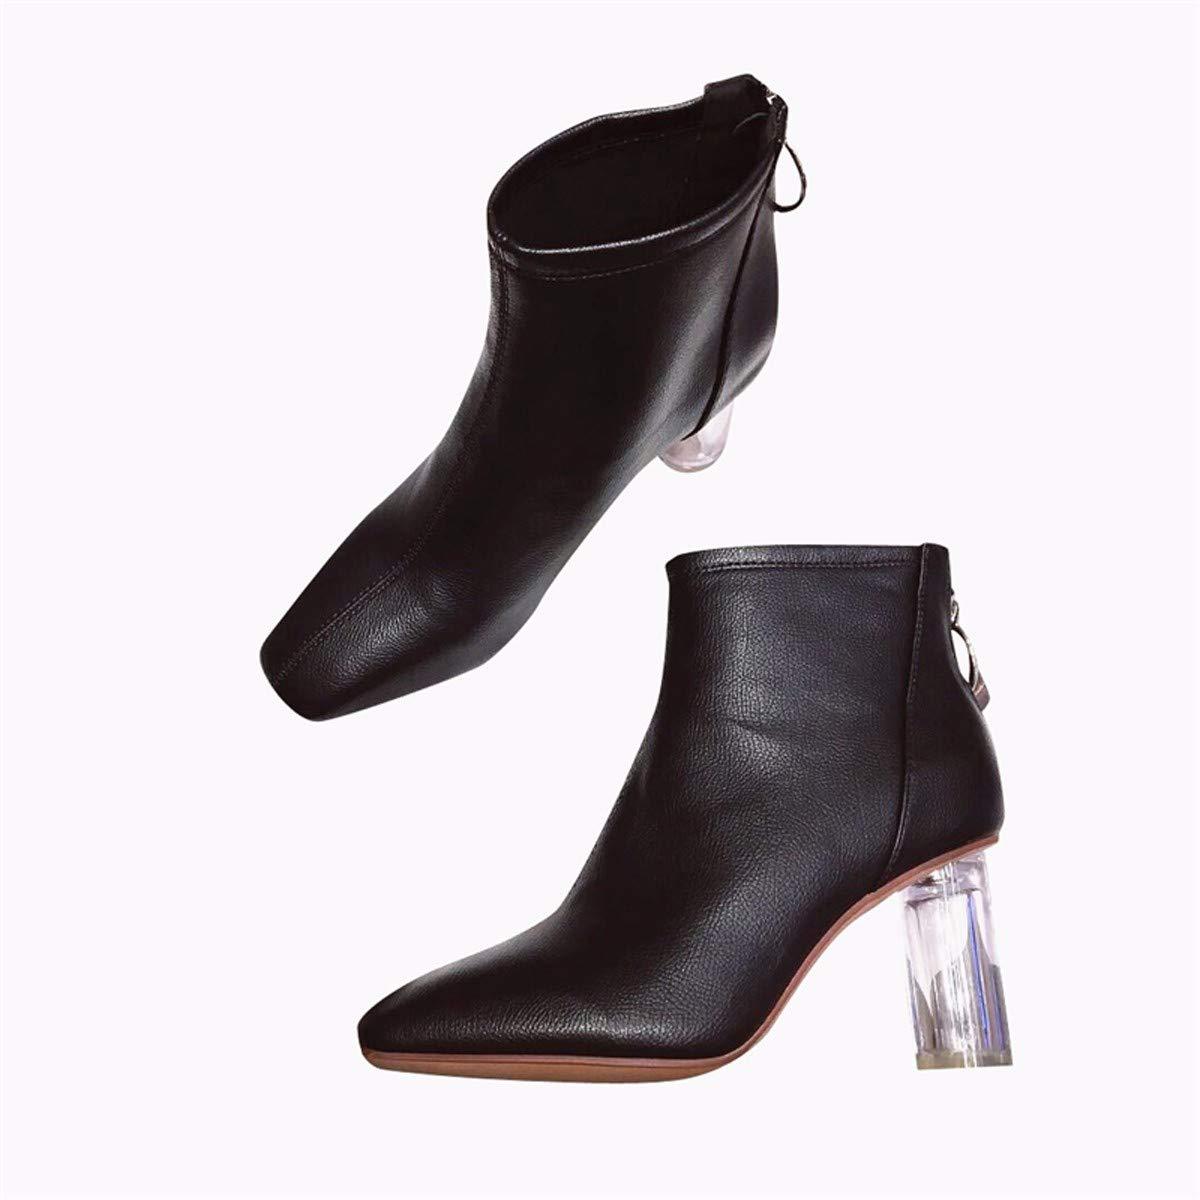 AJUNR Modische Arbeit Damenschuhe Ferse Stiefel Square hohe 7cm Transparente Crystal Ferse Kurze Stiefel und Stiefeletten ma dingxue